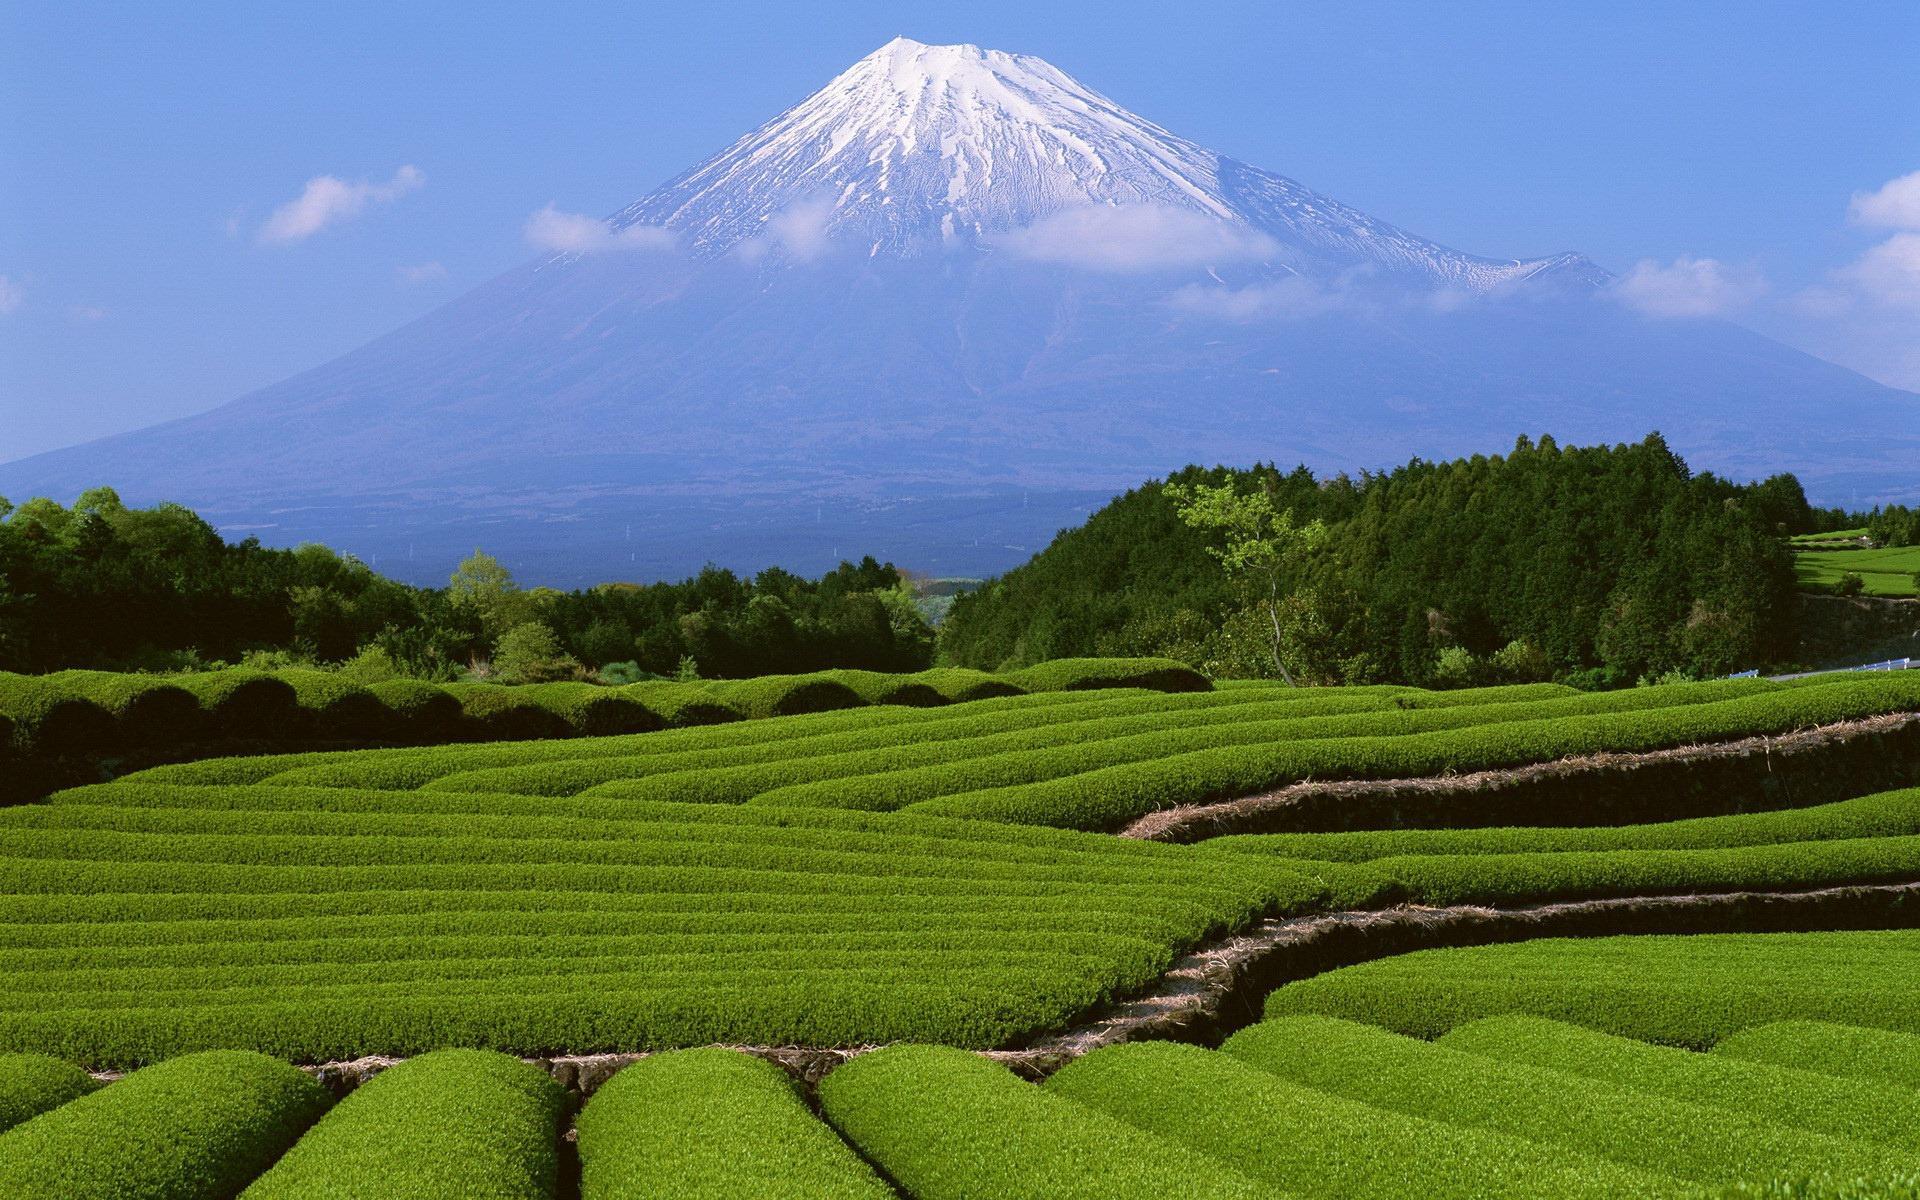 Flowers Gardens Wallpapers For Desktop Full Size - Fuji Mountain , HD Wallpaper & Backgrounds